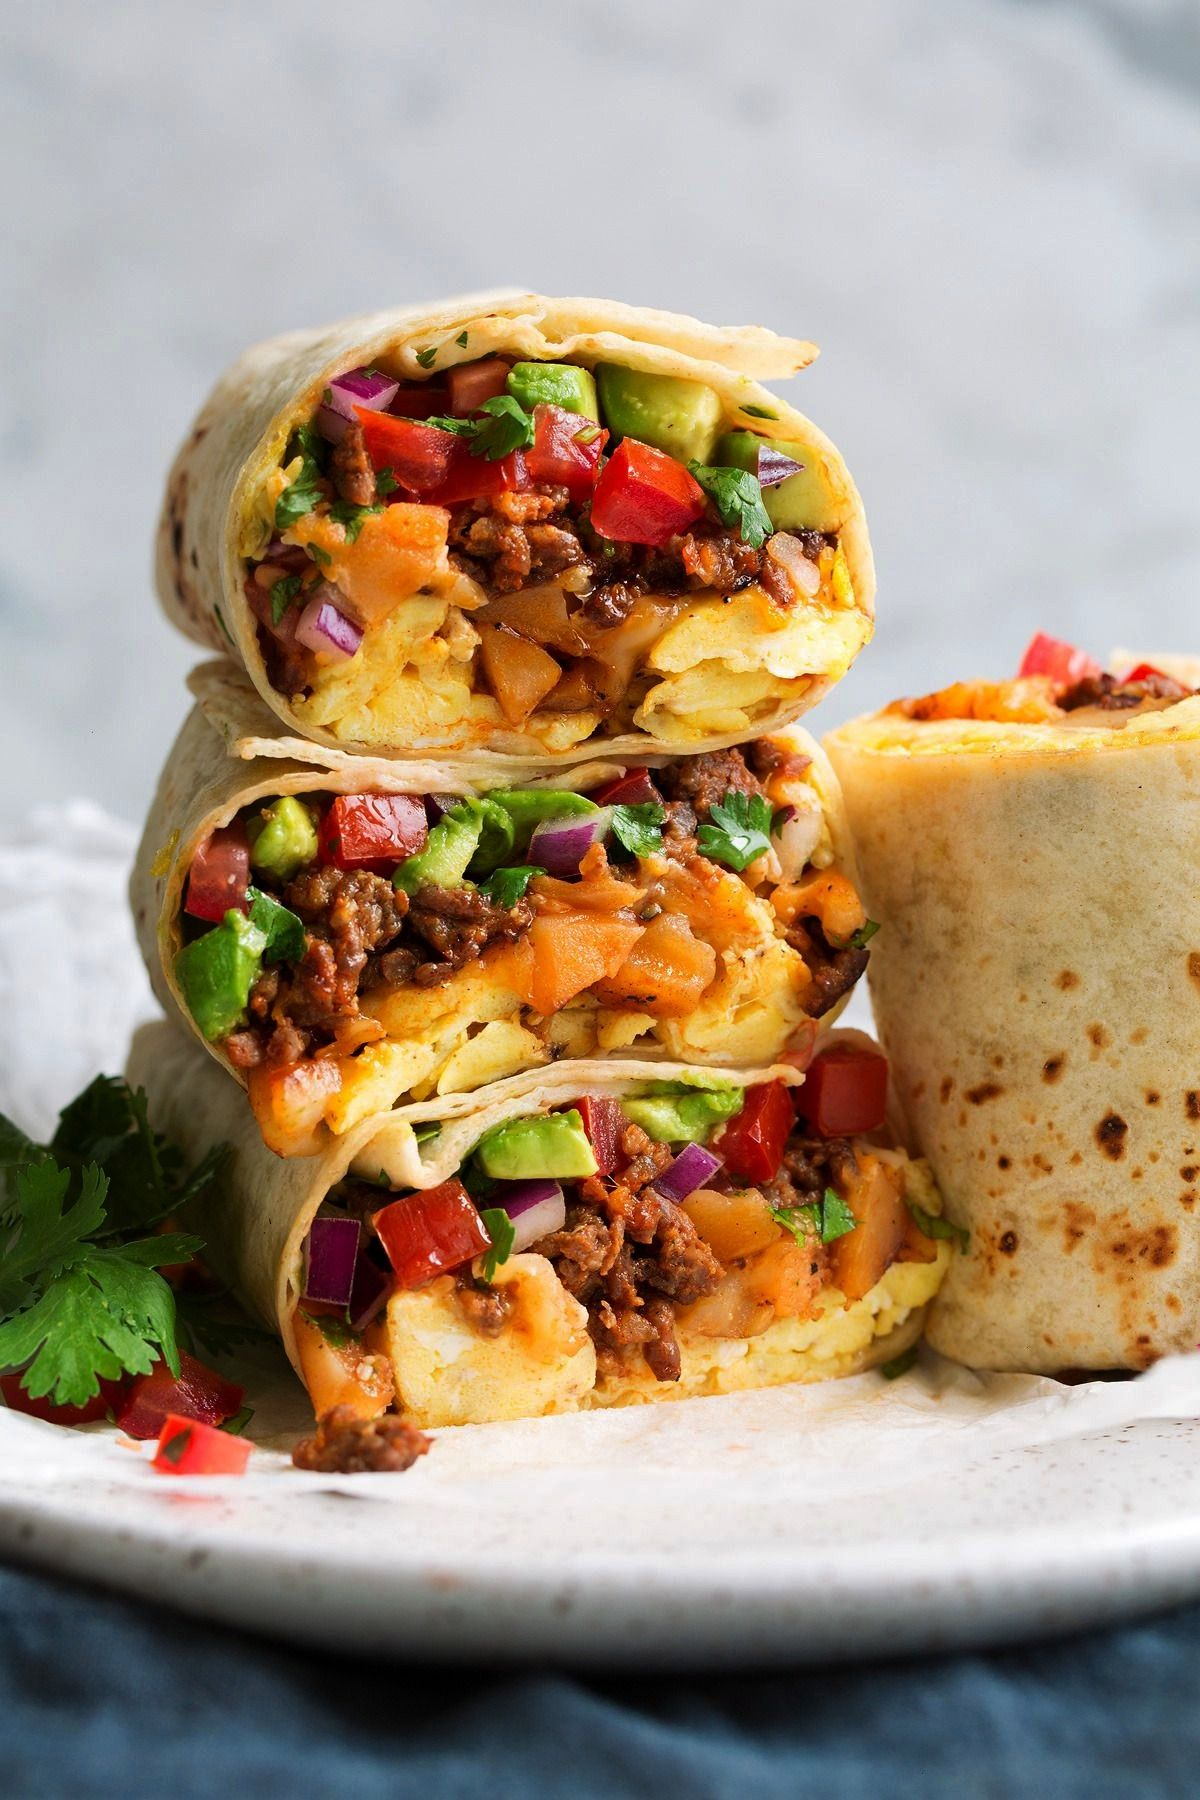 burrito -Breakfast burrito -  Healthy breakfast burritos stuffed with sweet potatoes, black beans,